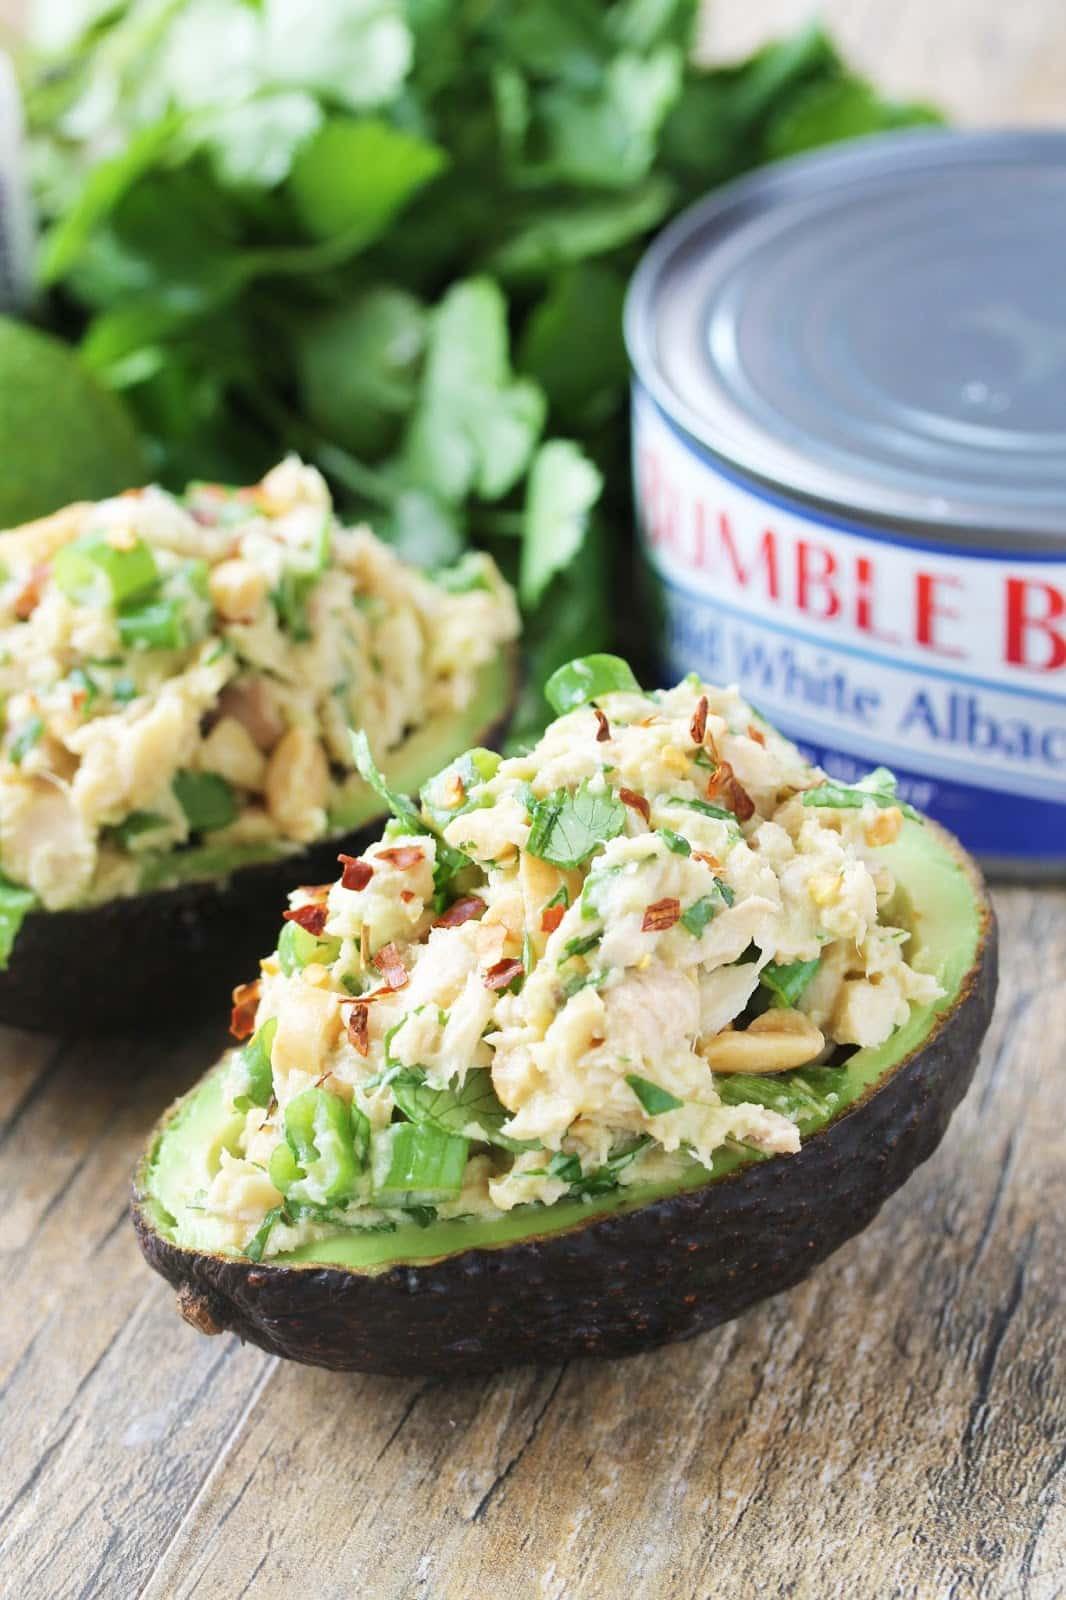 Healthy Recipes With Avocado  Healthy Thai Tuna Stuffed Avocado